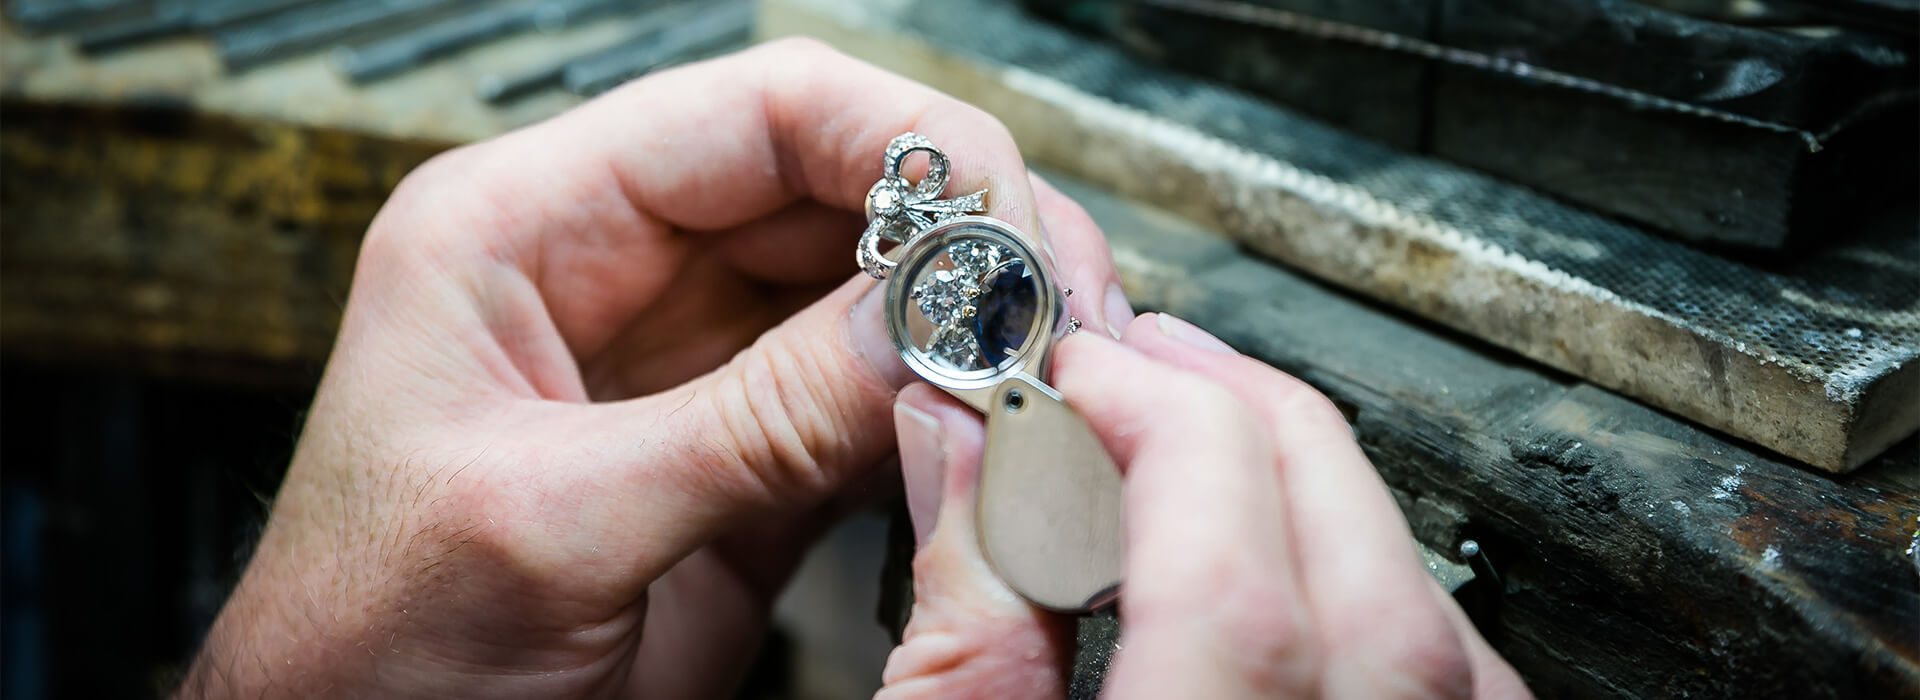 Jewellery Repairs in Guildford